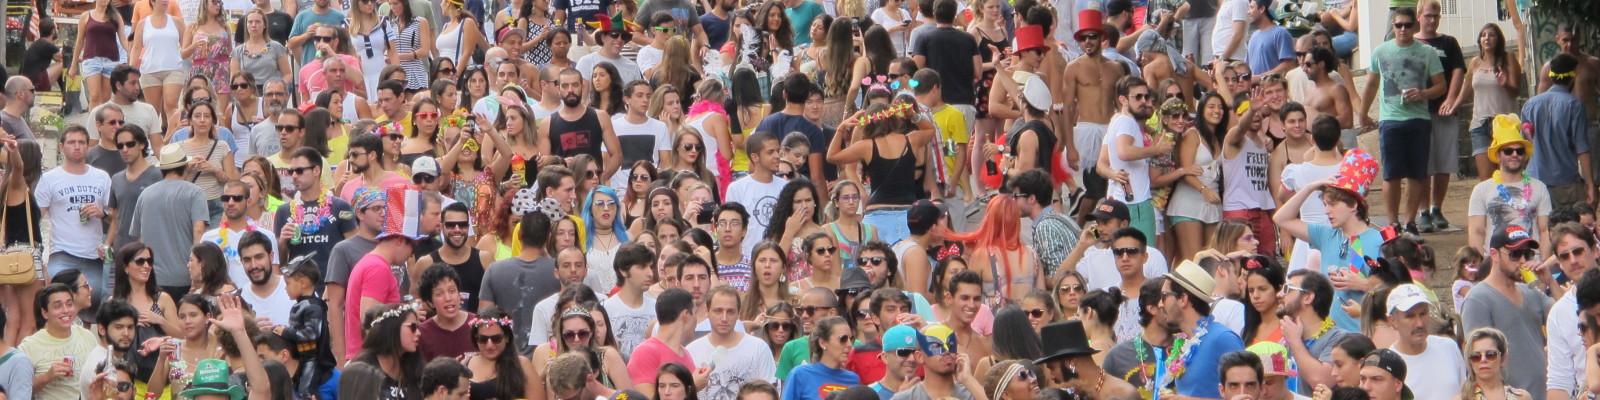 Carnaval_Rua_Bloco_Sargento_Pimenta_07022015_Foto_MarceloIha (3)